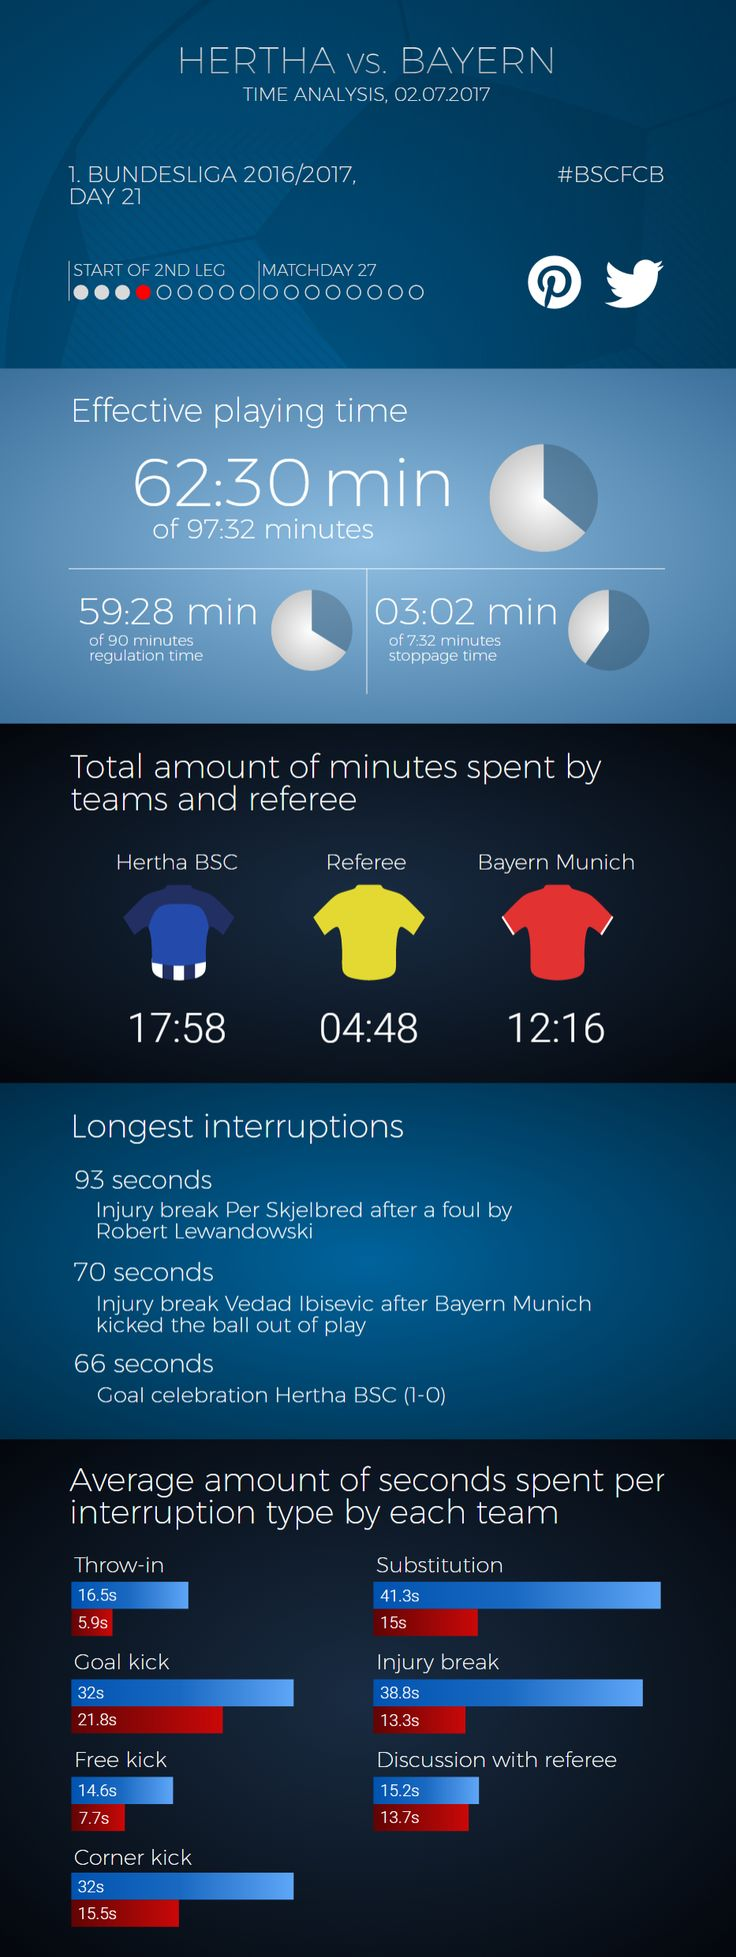 Game Time Analysis of Hertha BSC vs. Bayern Munich on matchday 21 in German Bundesliga 2016/17